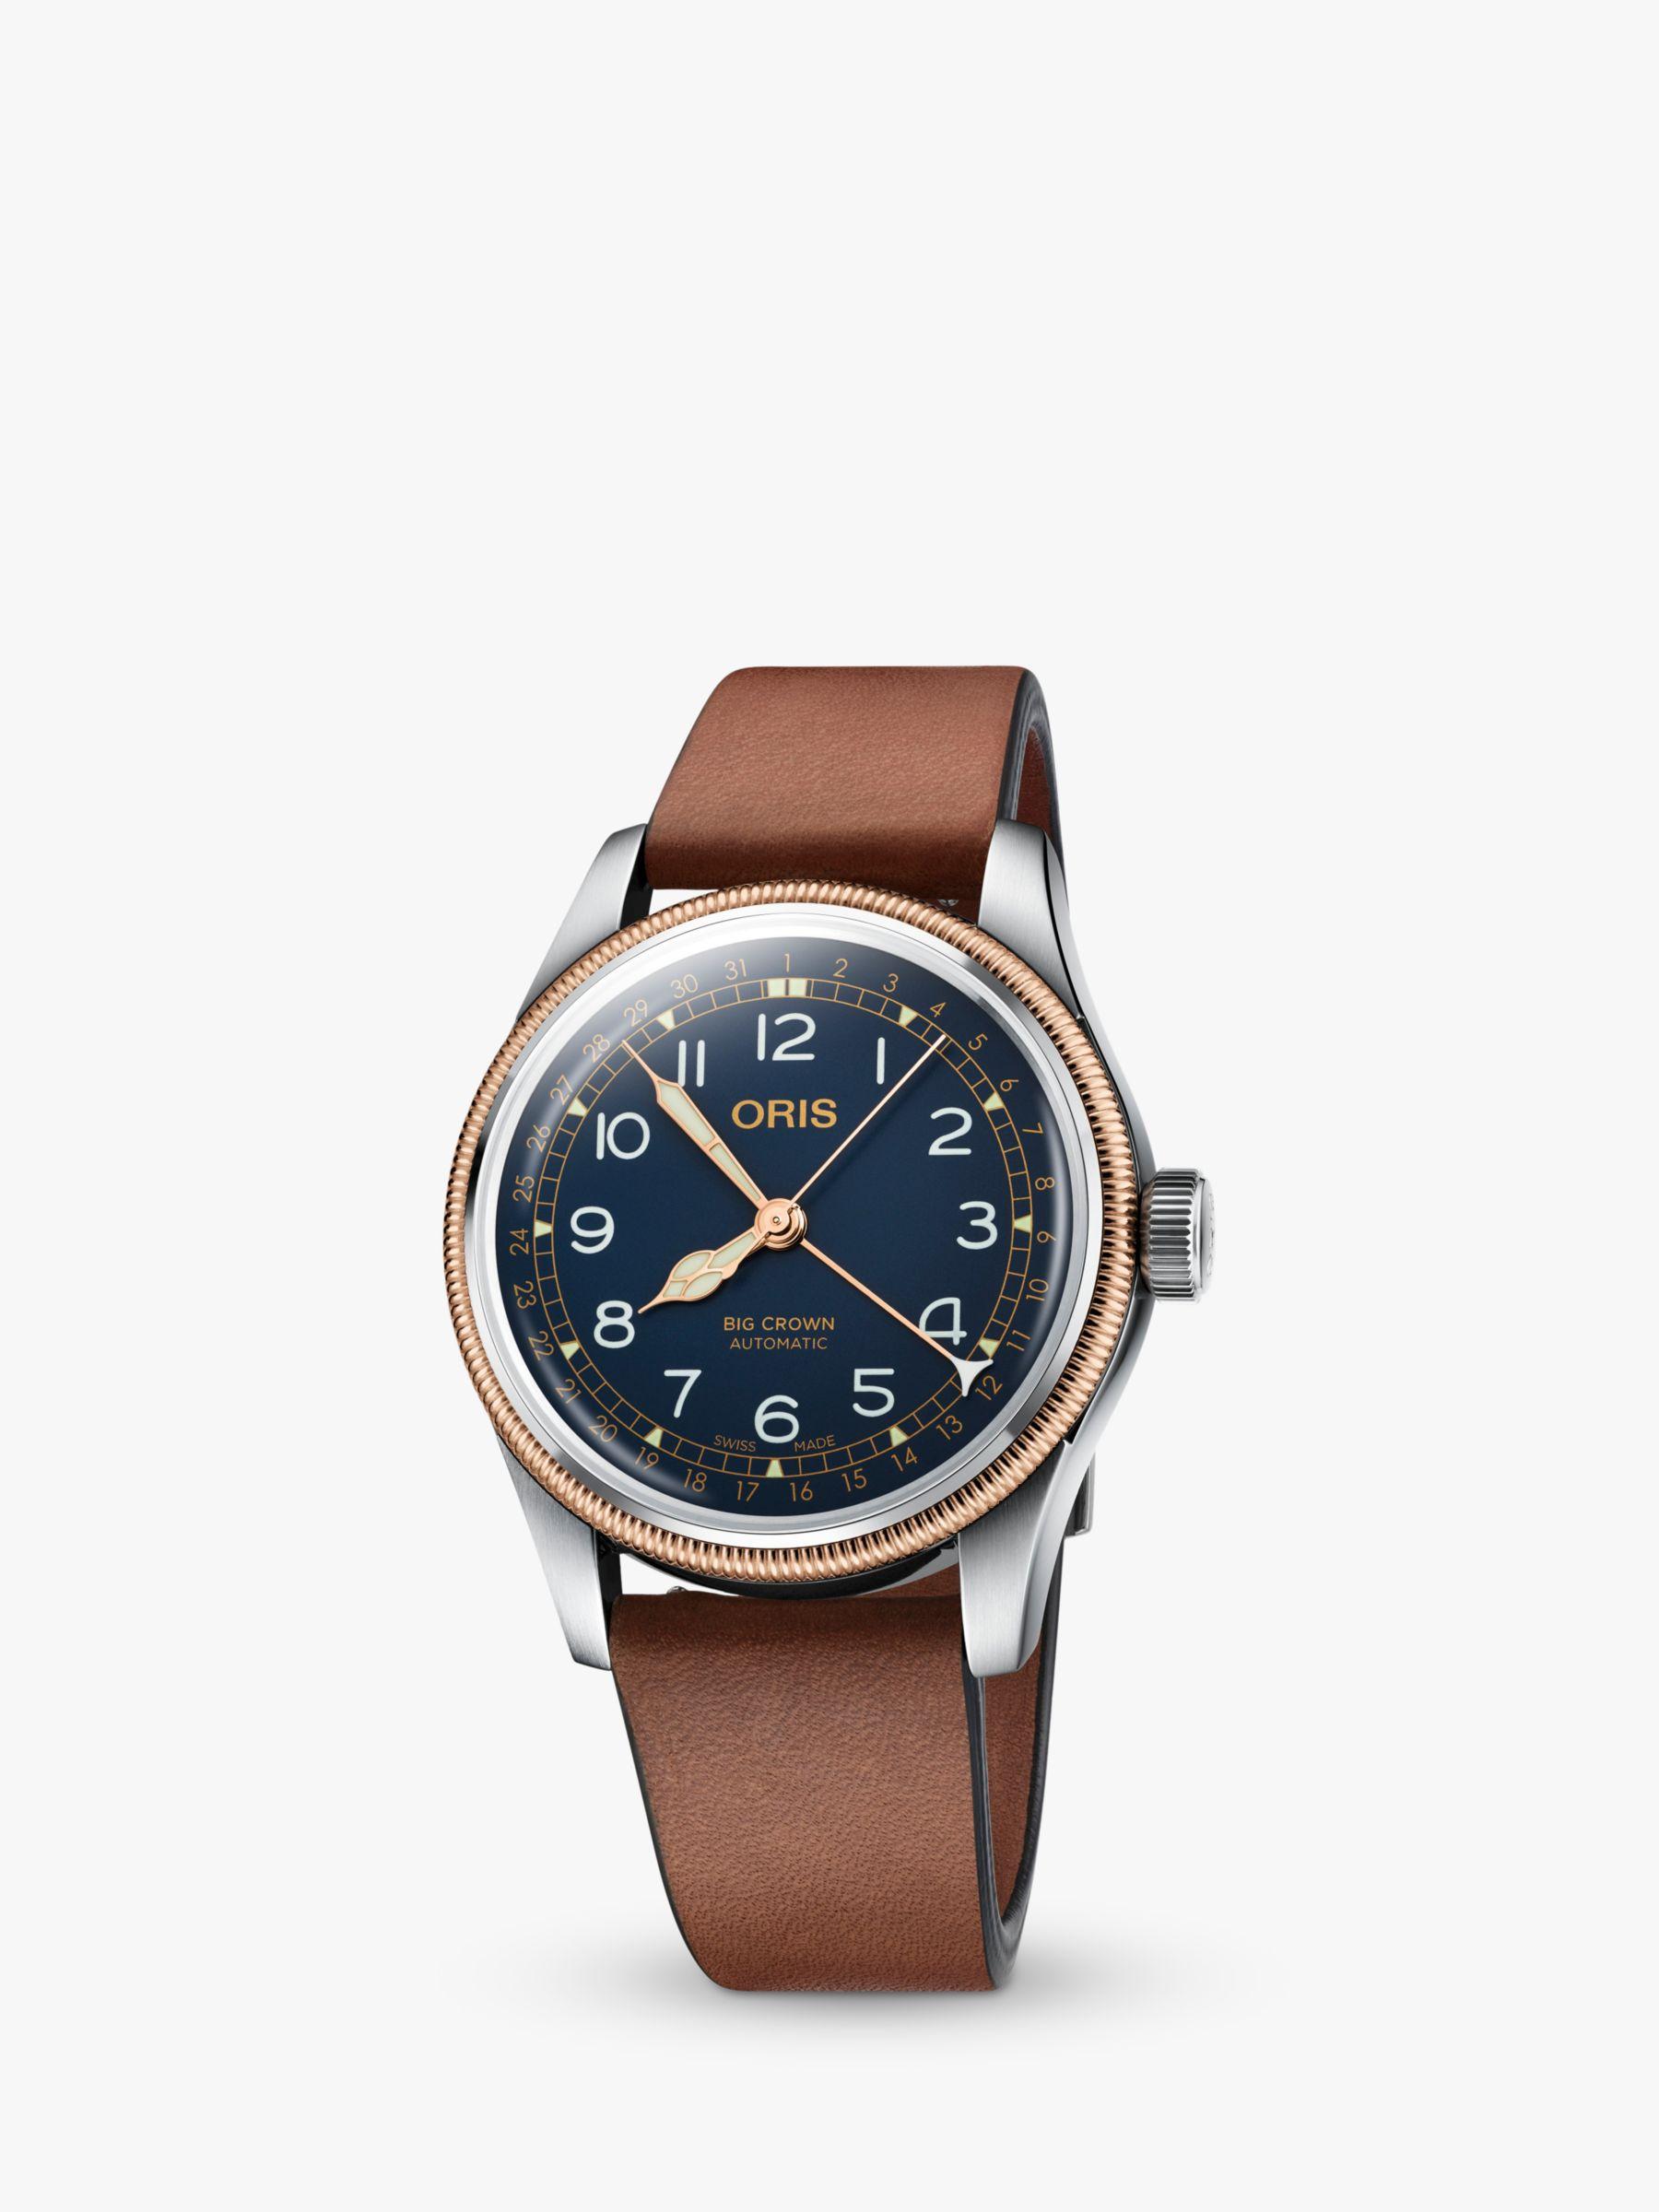 Oris Oris 754 7741 4365-52058BR Men's Big Crown Automatic Leather Strap Watch, Tan/Blue